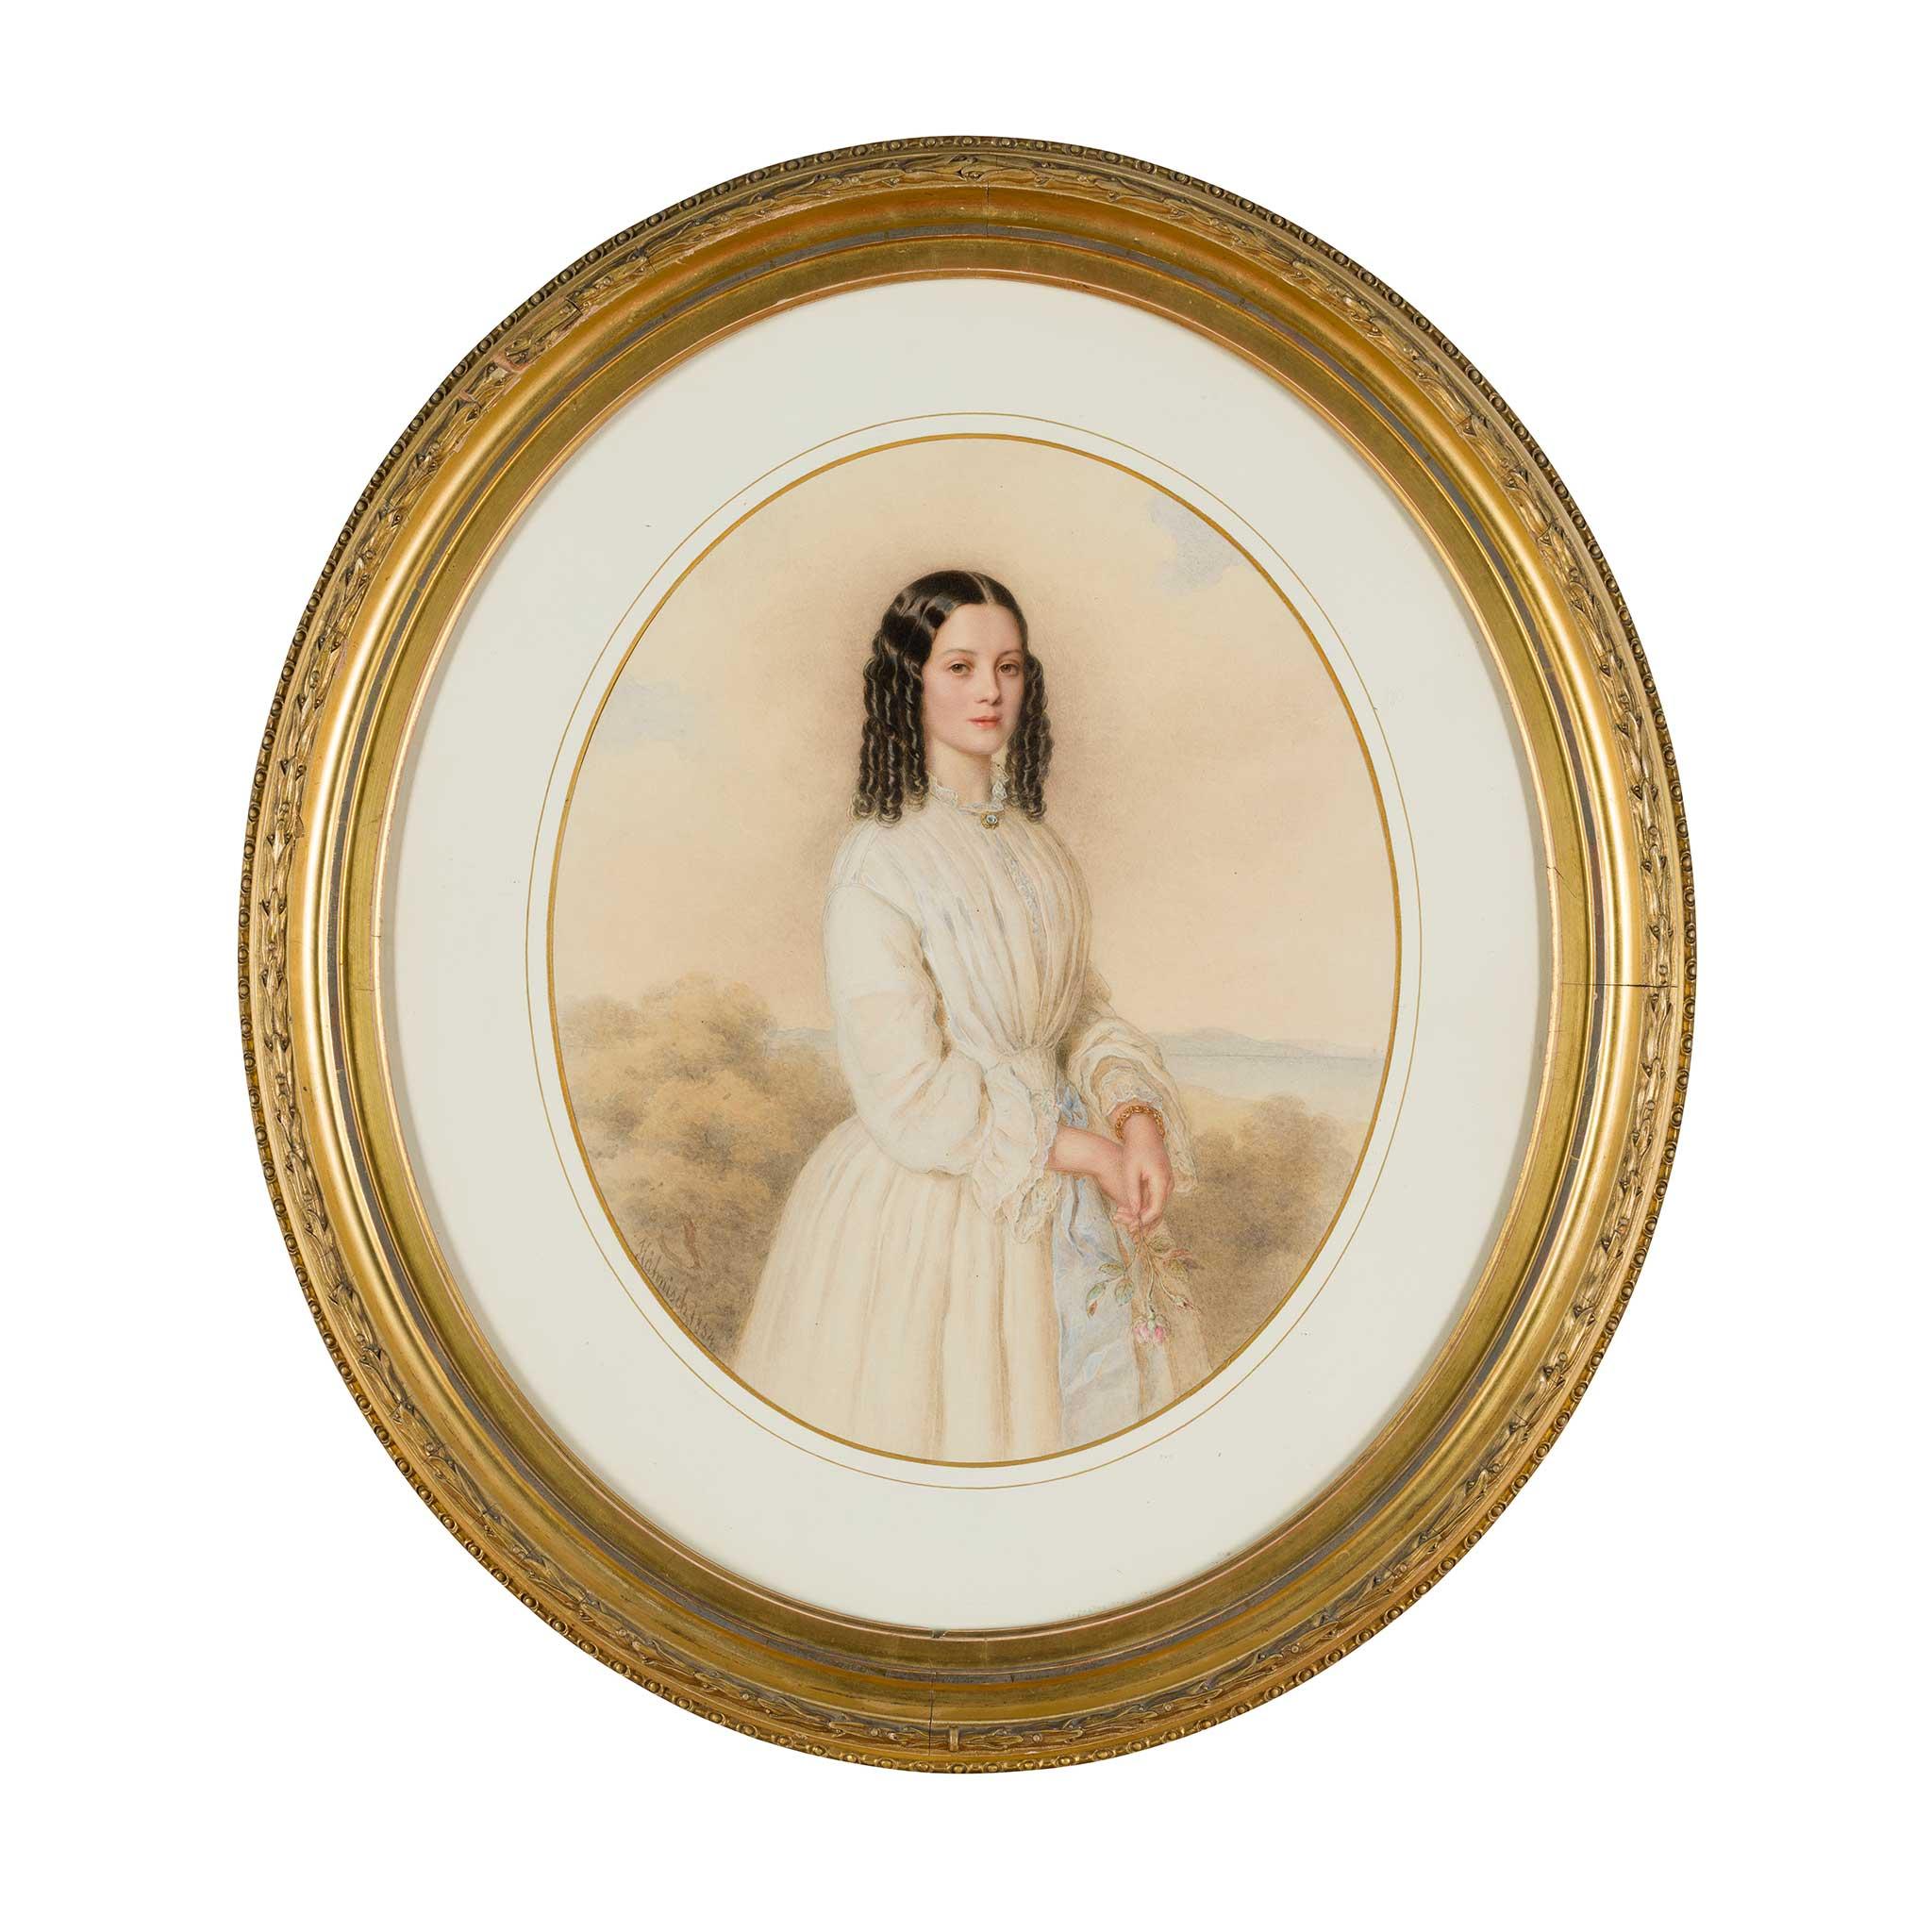 ANTON HÄHNISCH (AUSTRIAN 1817-1897) THREE QUARTER LENGTH PORTRAIT OF A YOUNG LADY HOLDING A ROSE - Image 3 of 4